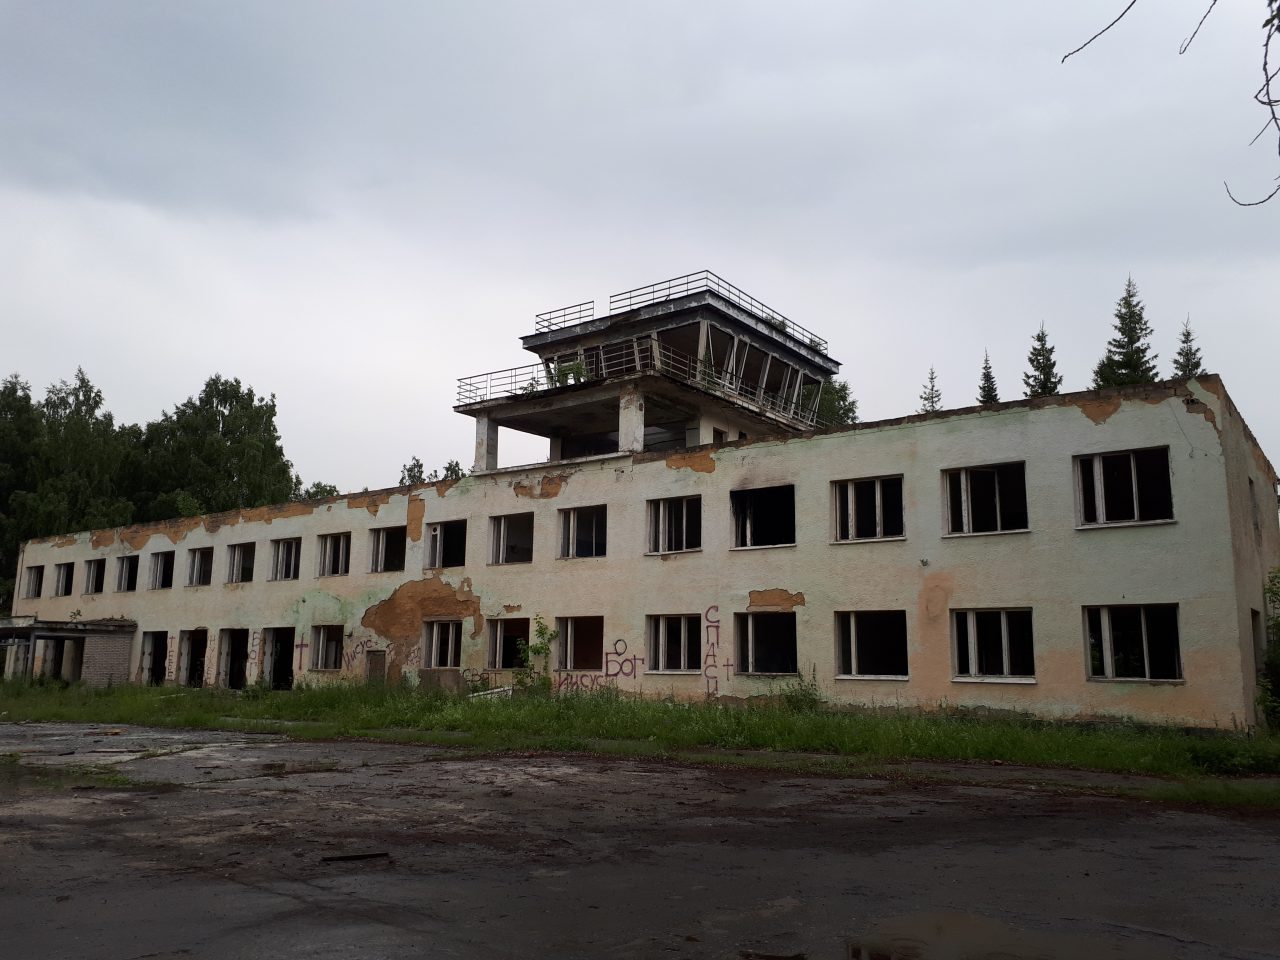 Заброшенный аэропорт, Белорецк, Башкортостан